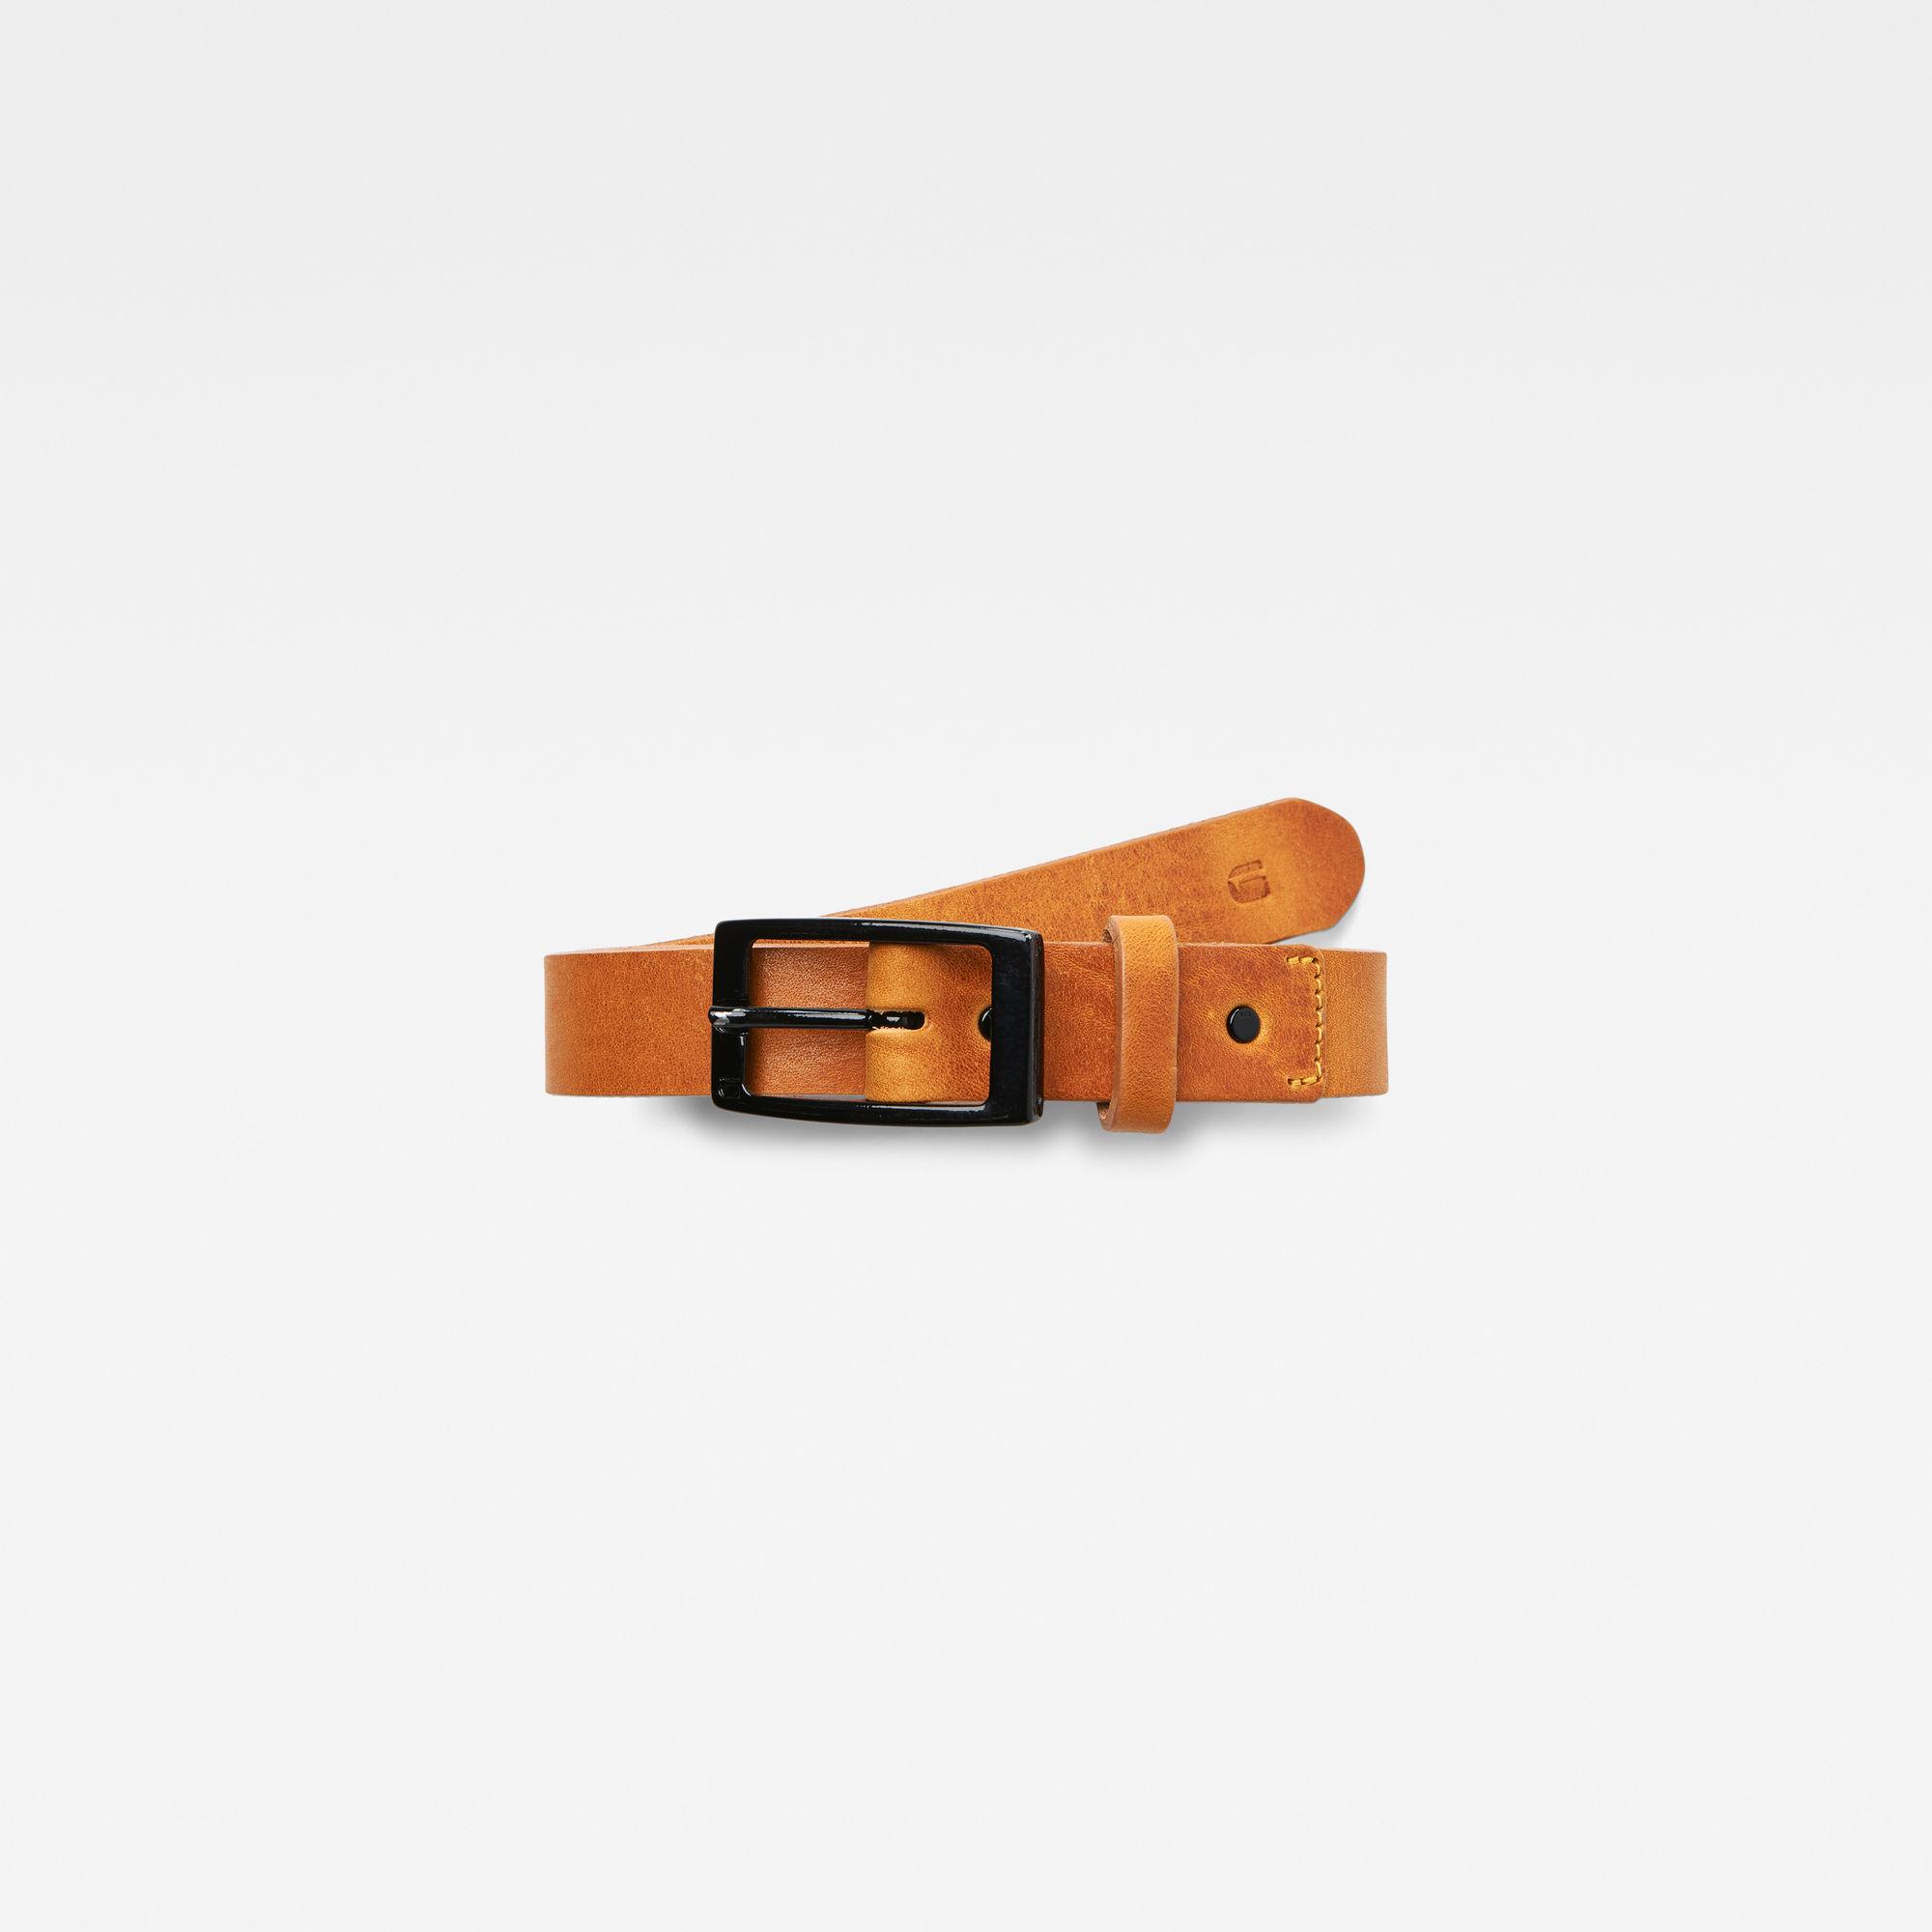 Image of Estan Belt